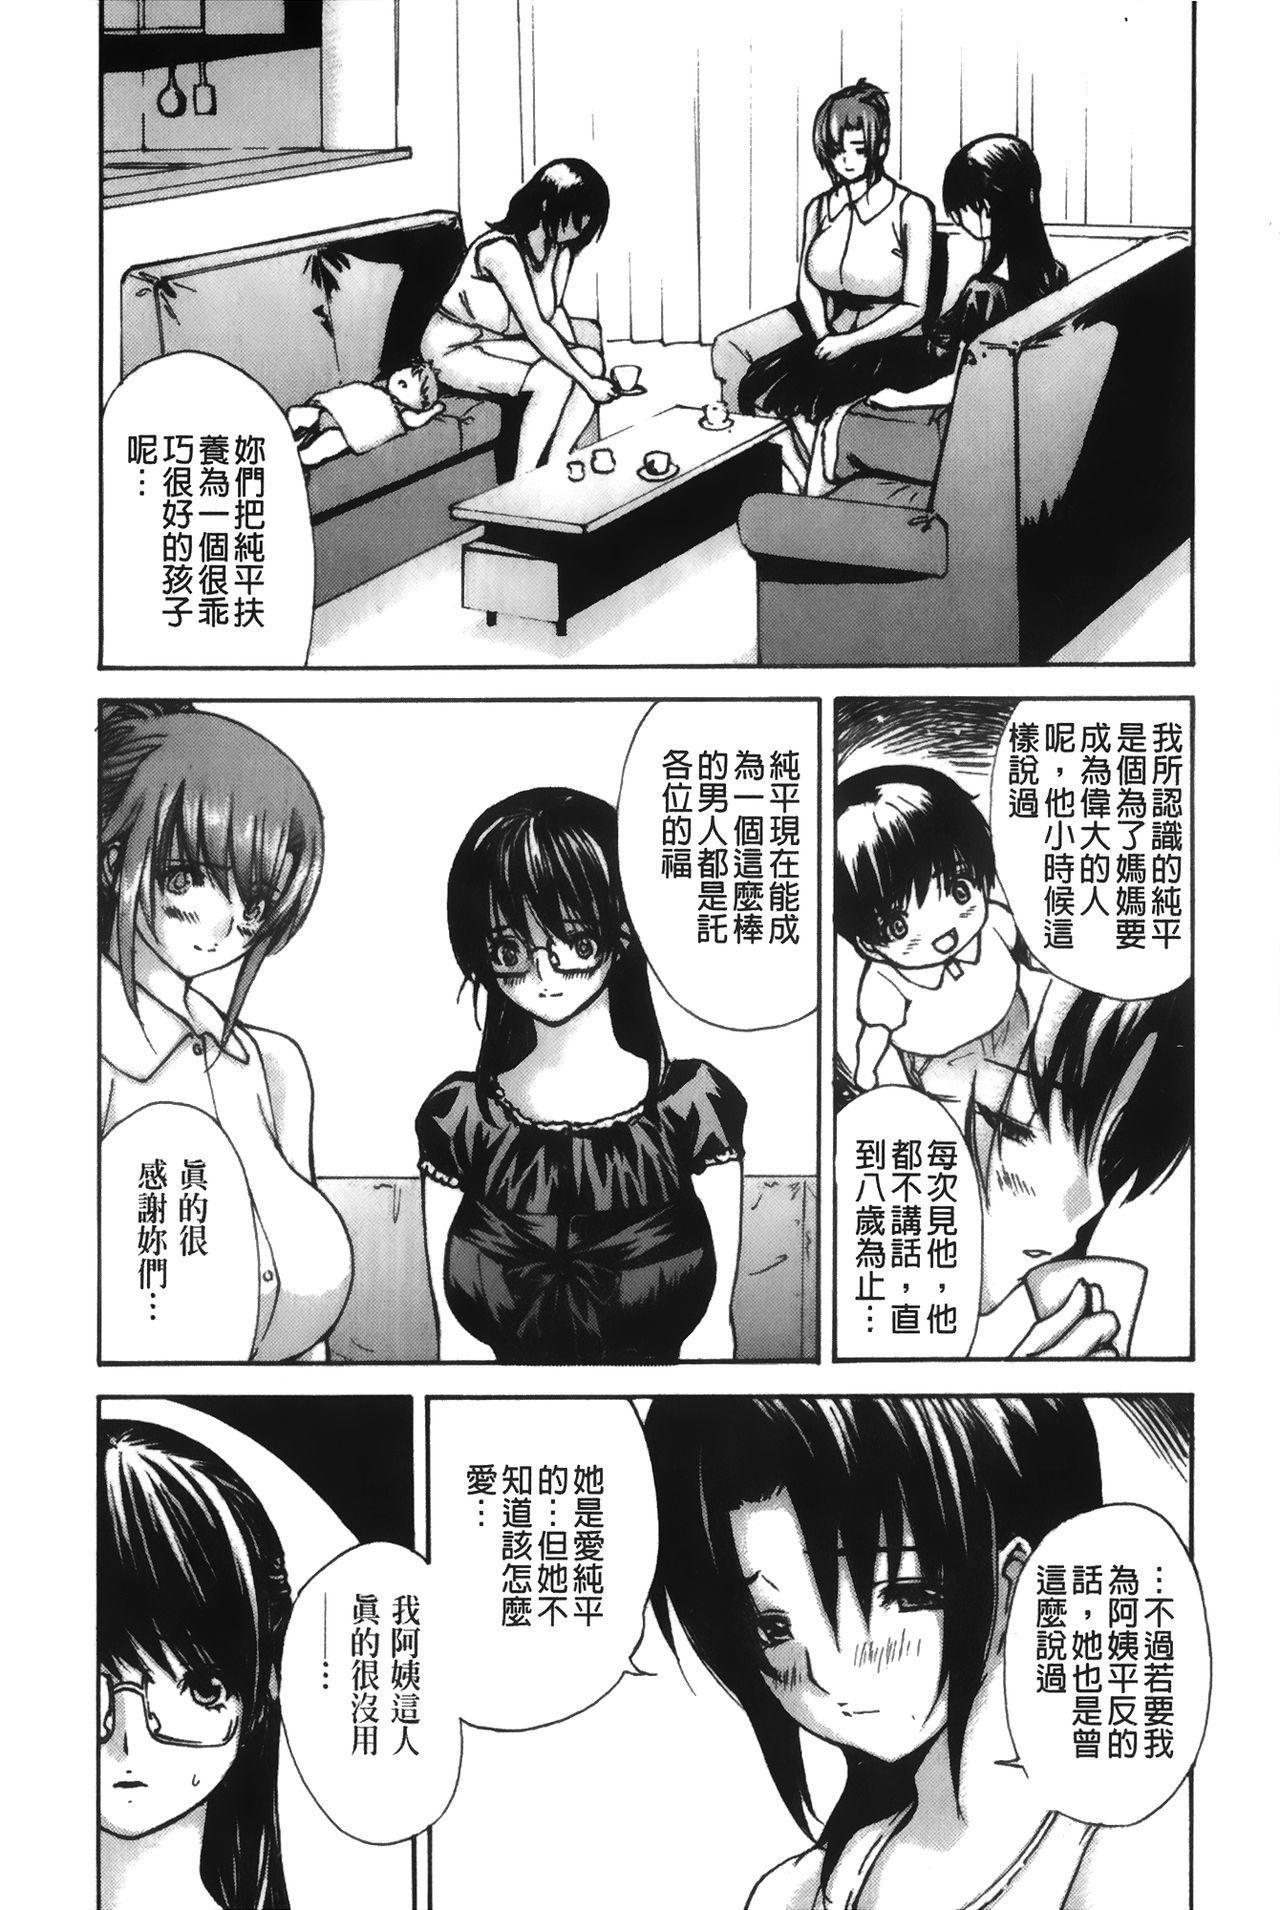 Tonari no Minano Sensei 4 | 隔壁的美奈乃老師 4 189